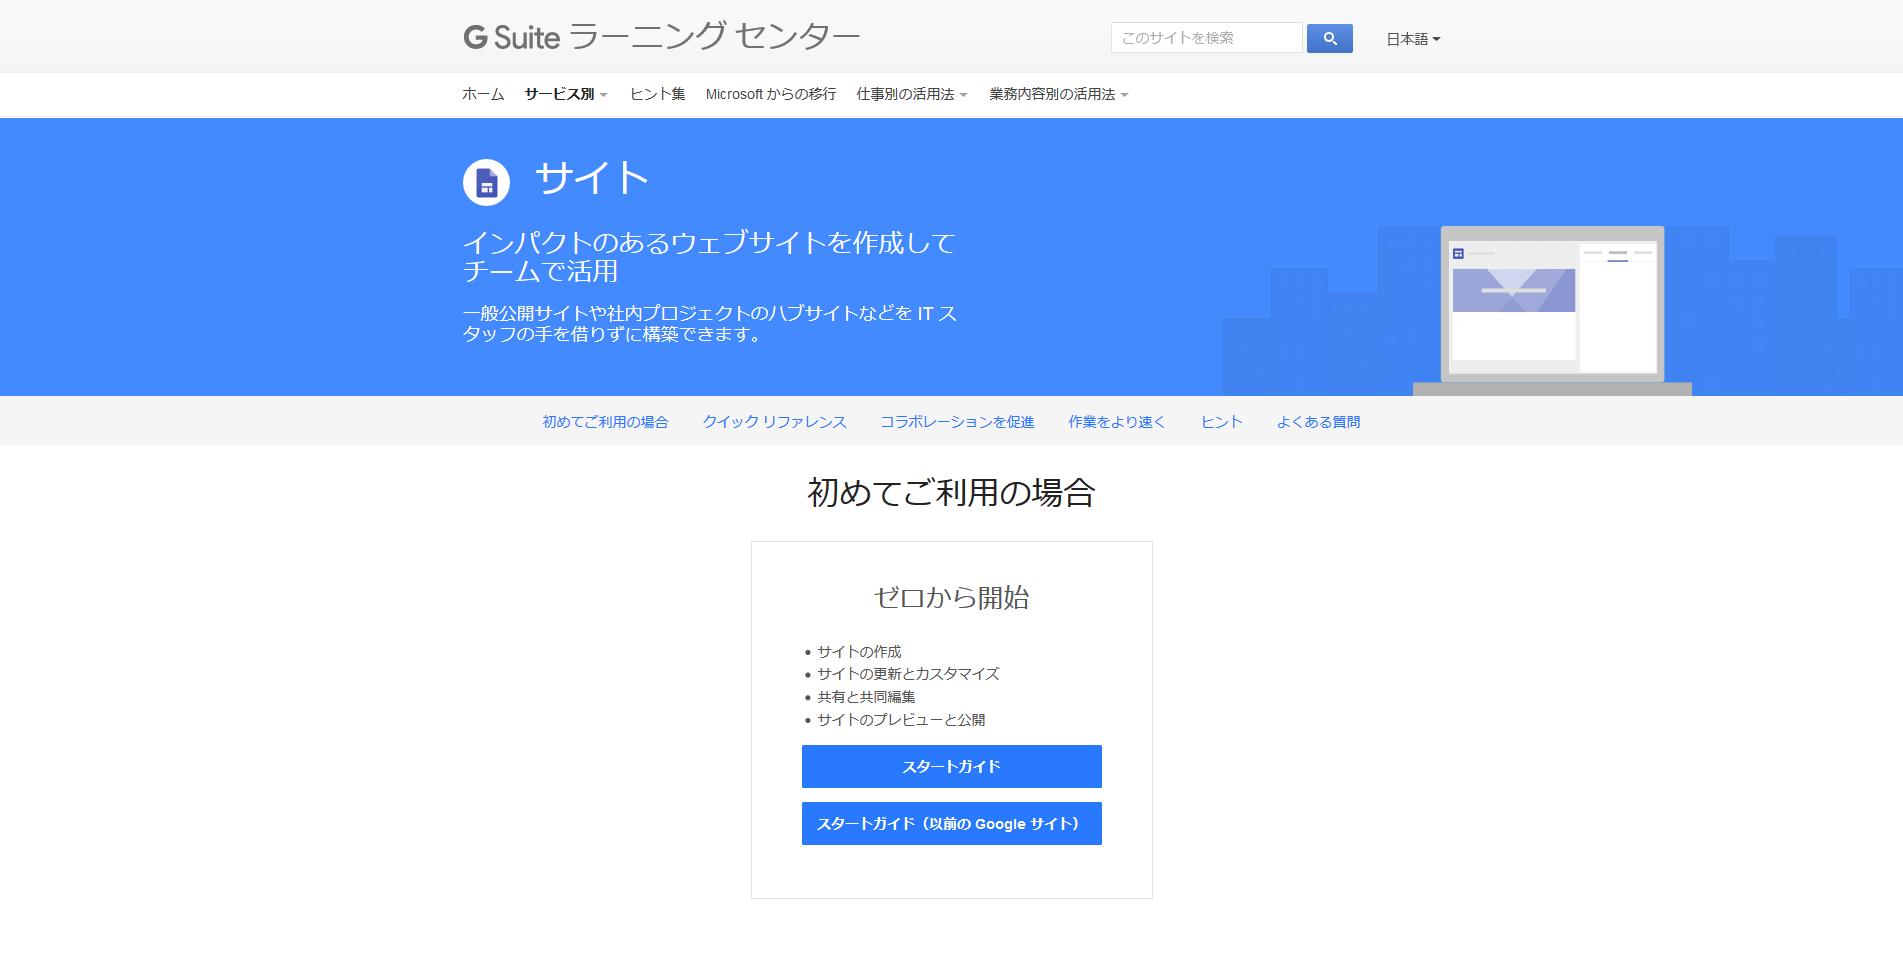 Gsuit(Googleサイト)